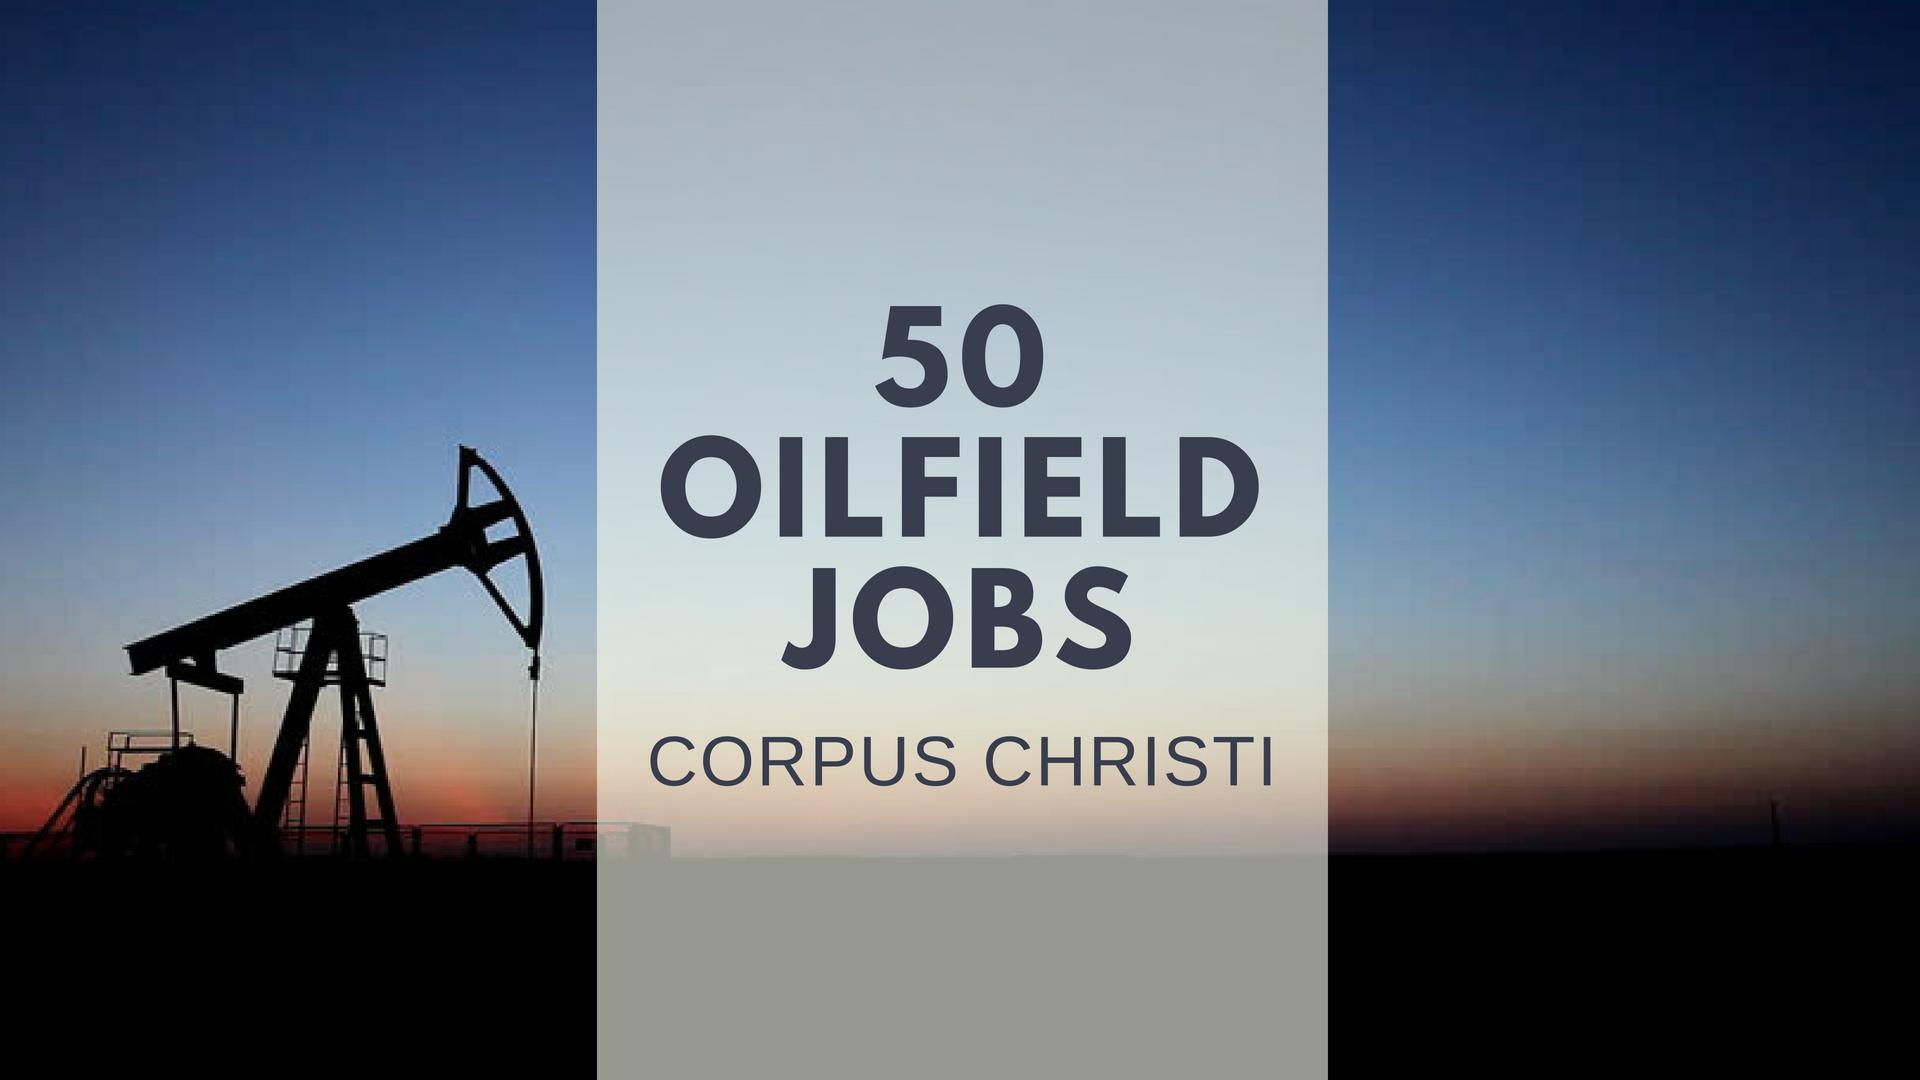 50 Oilfield Job Openings Corpus Christi Tx Oilfield1